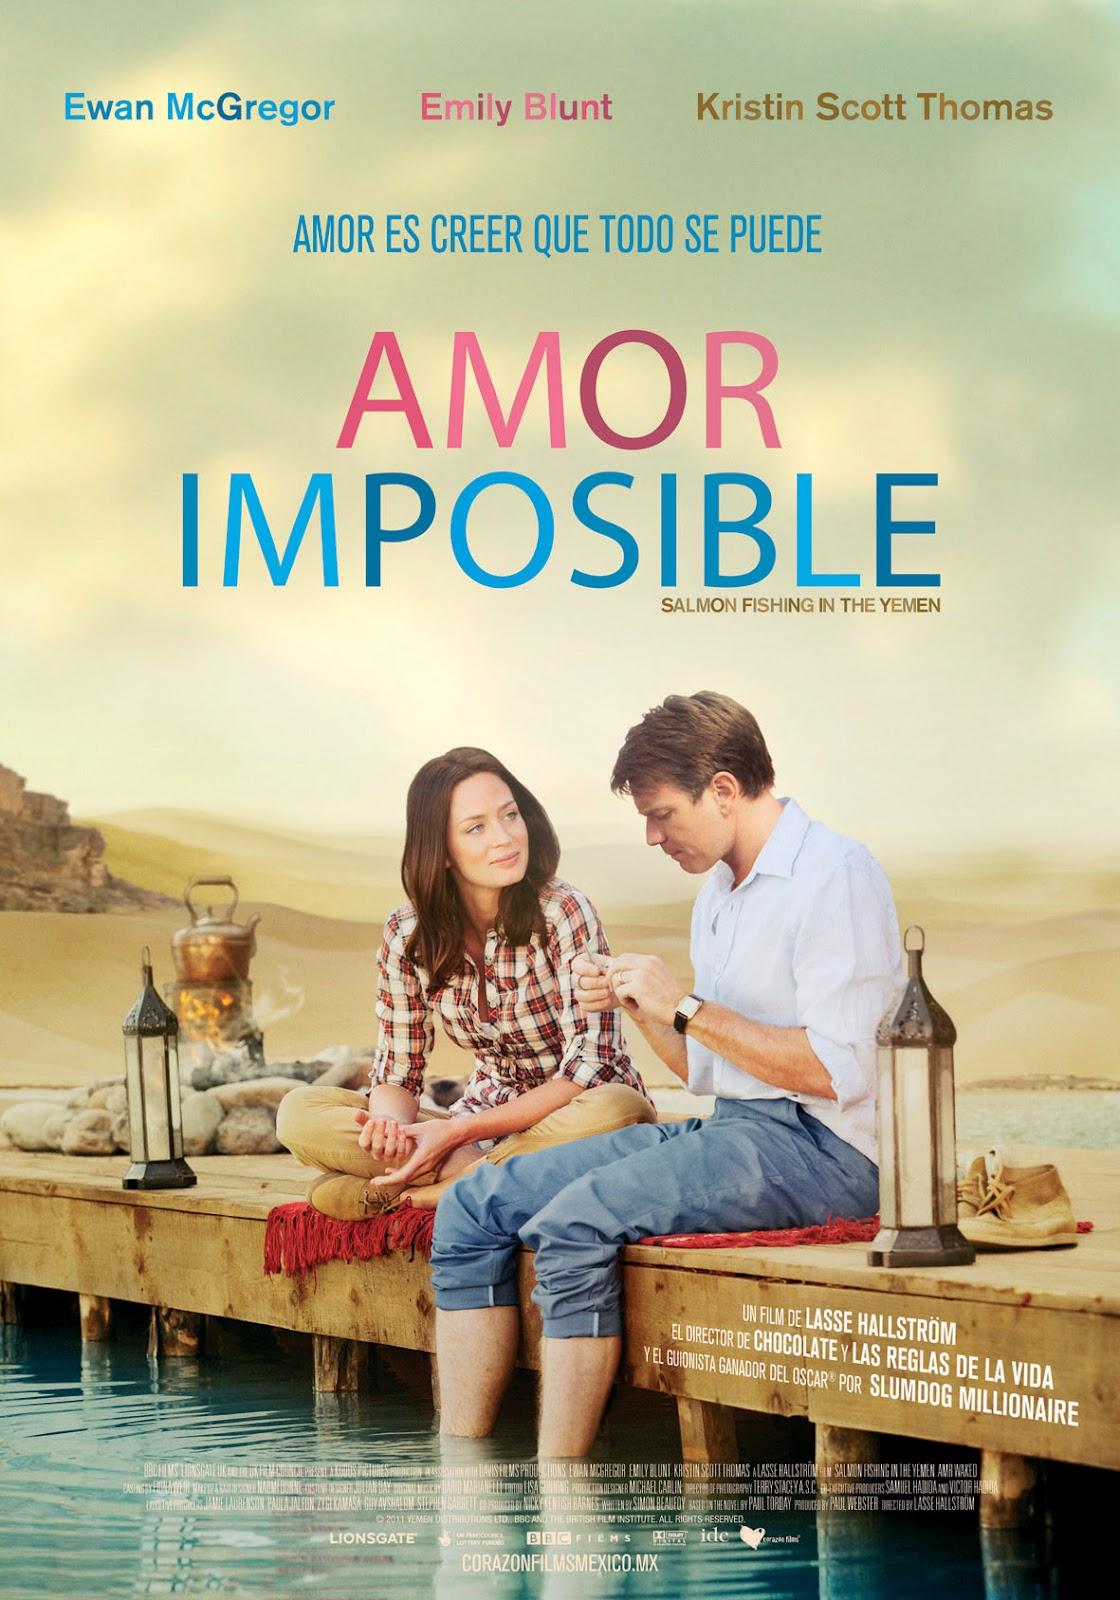 http://1.bp.blogspot.com/-ApQfhtKC1Ns/T9Psw9yW9dI/AAAAAAAAEek/FA-fJouh1uE/s1600/Amor+Imposible+Poster.jpg